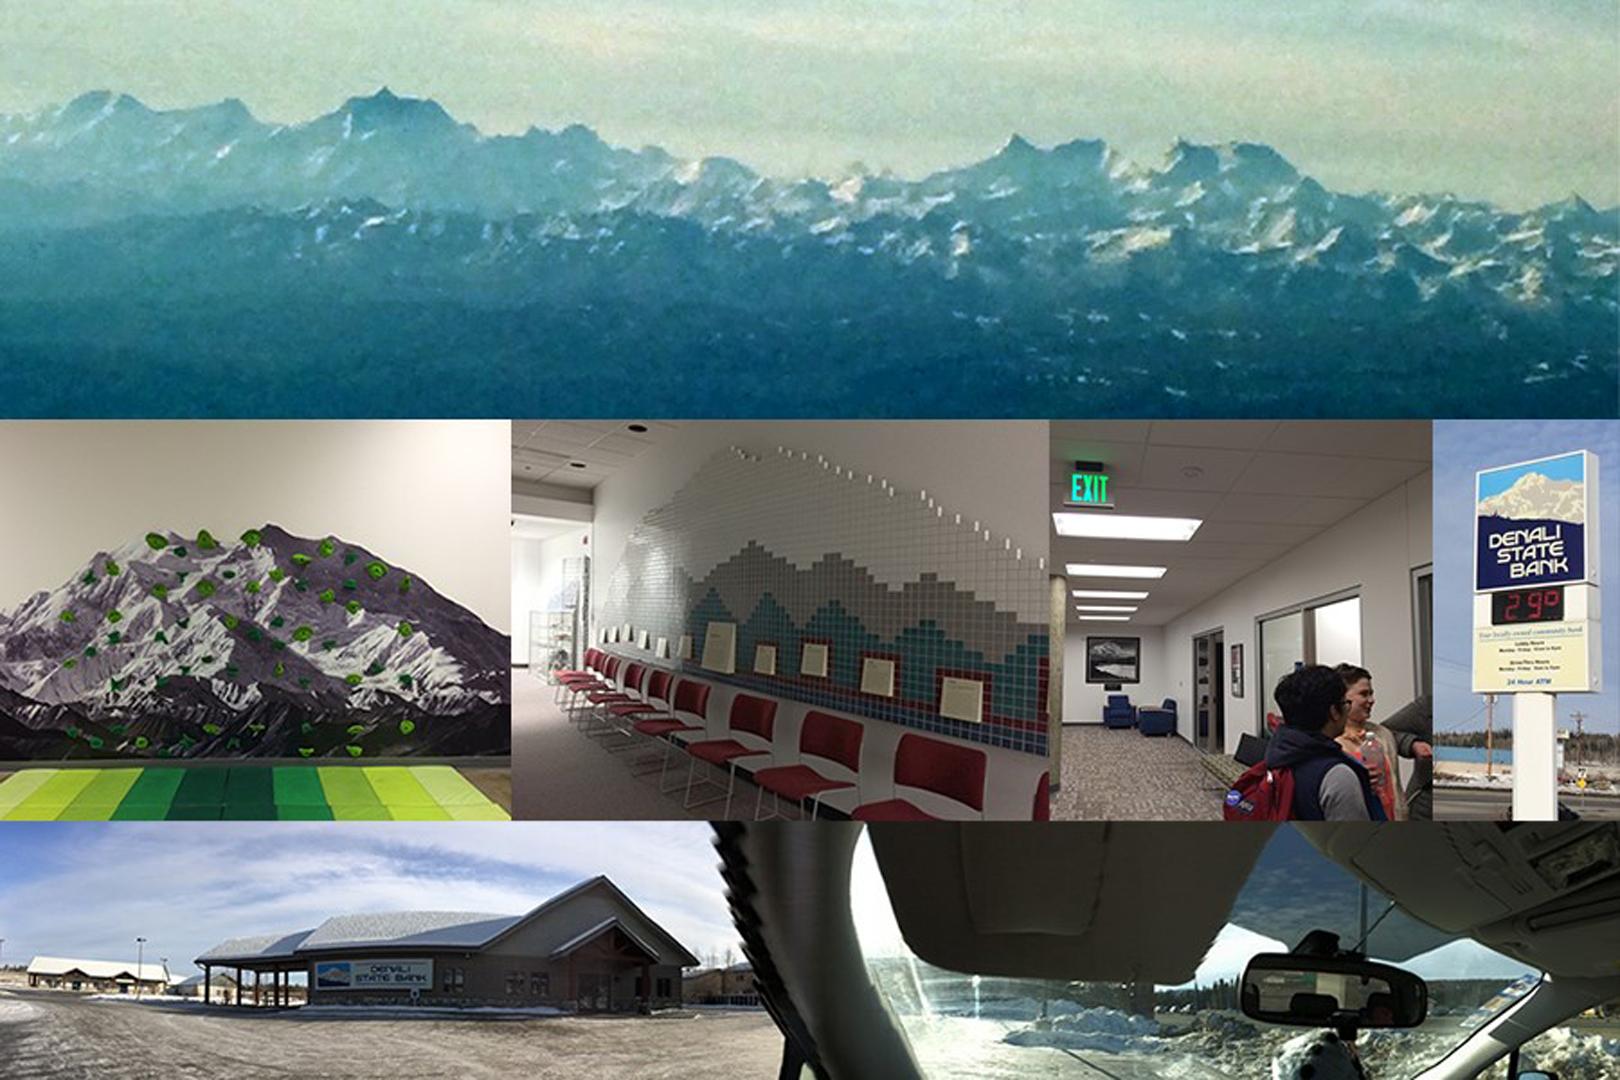 ©ISEA2016: 22nd International Symposium on Electronic Art, Miho Aoki, Forty-nine Views of Denali (mt. Mckinley)